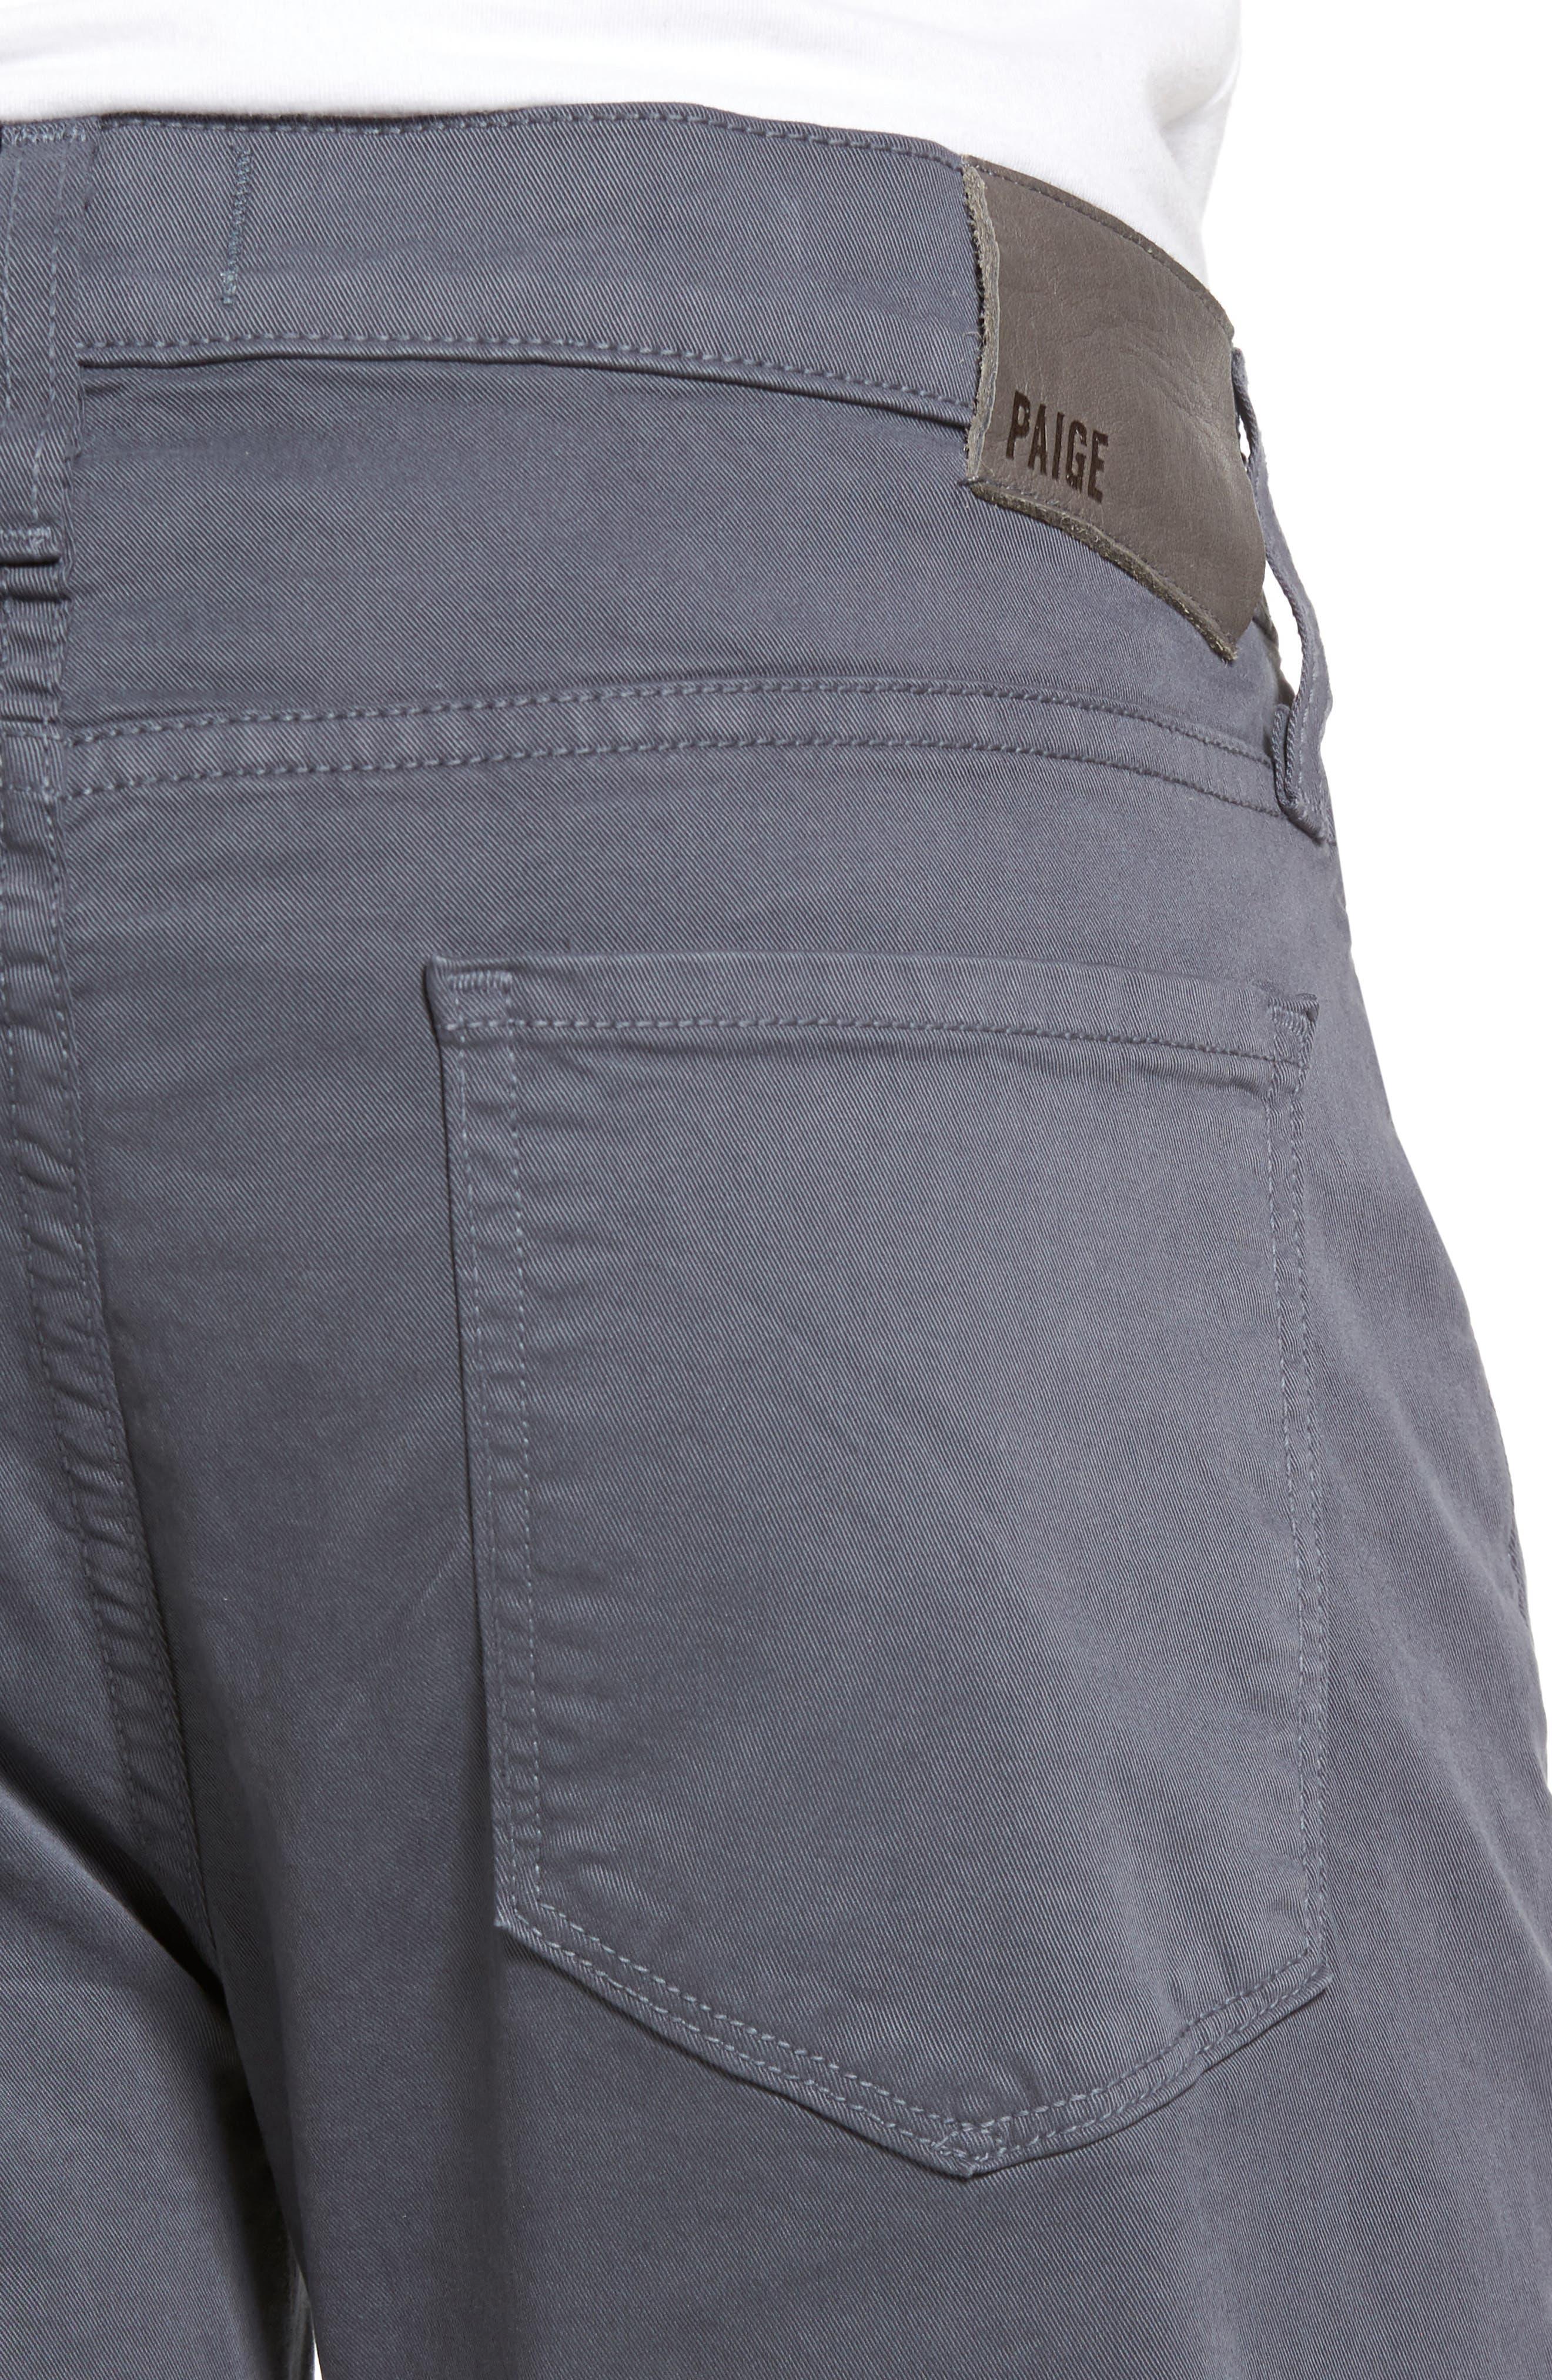 Federal Slim Straight Leg Twill Pants,                             Alternate thumbnail 4, color,                             MOON SHADE